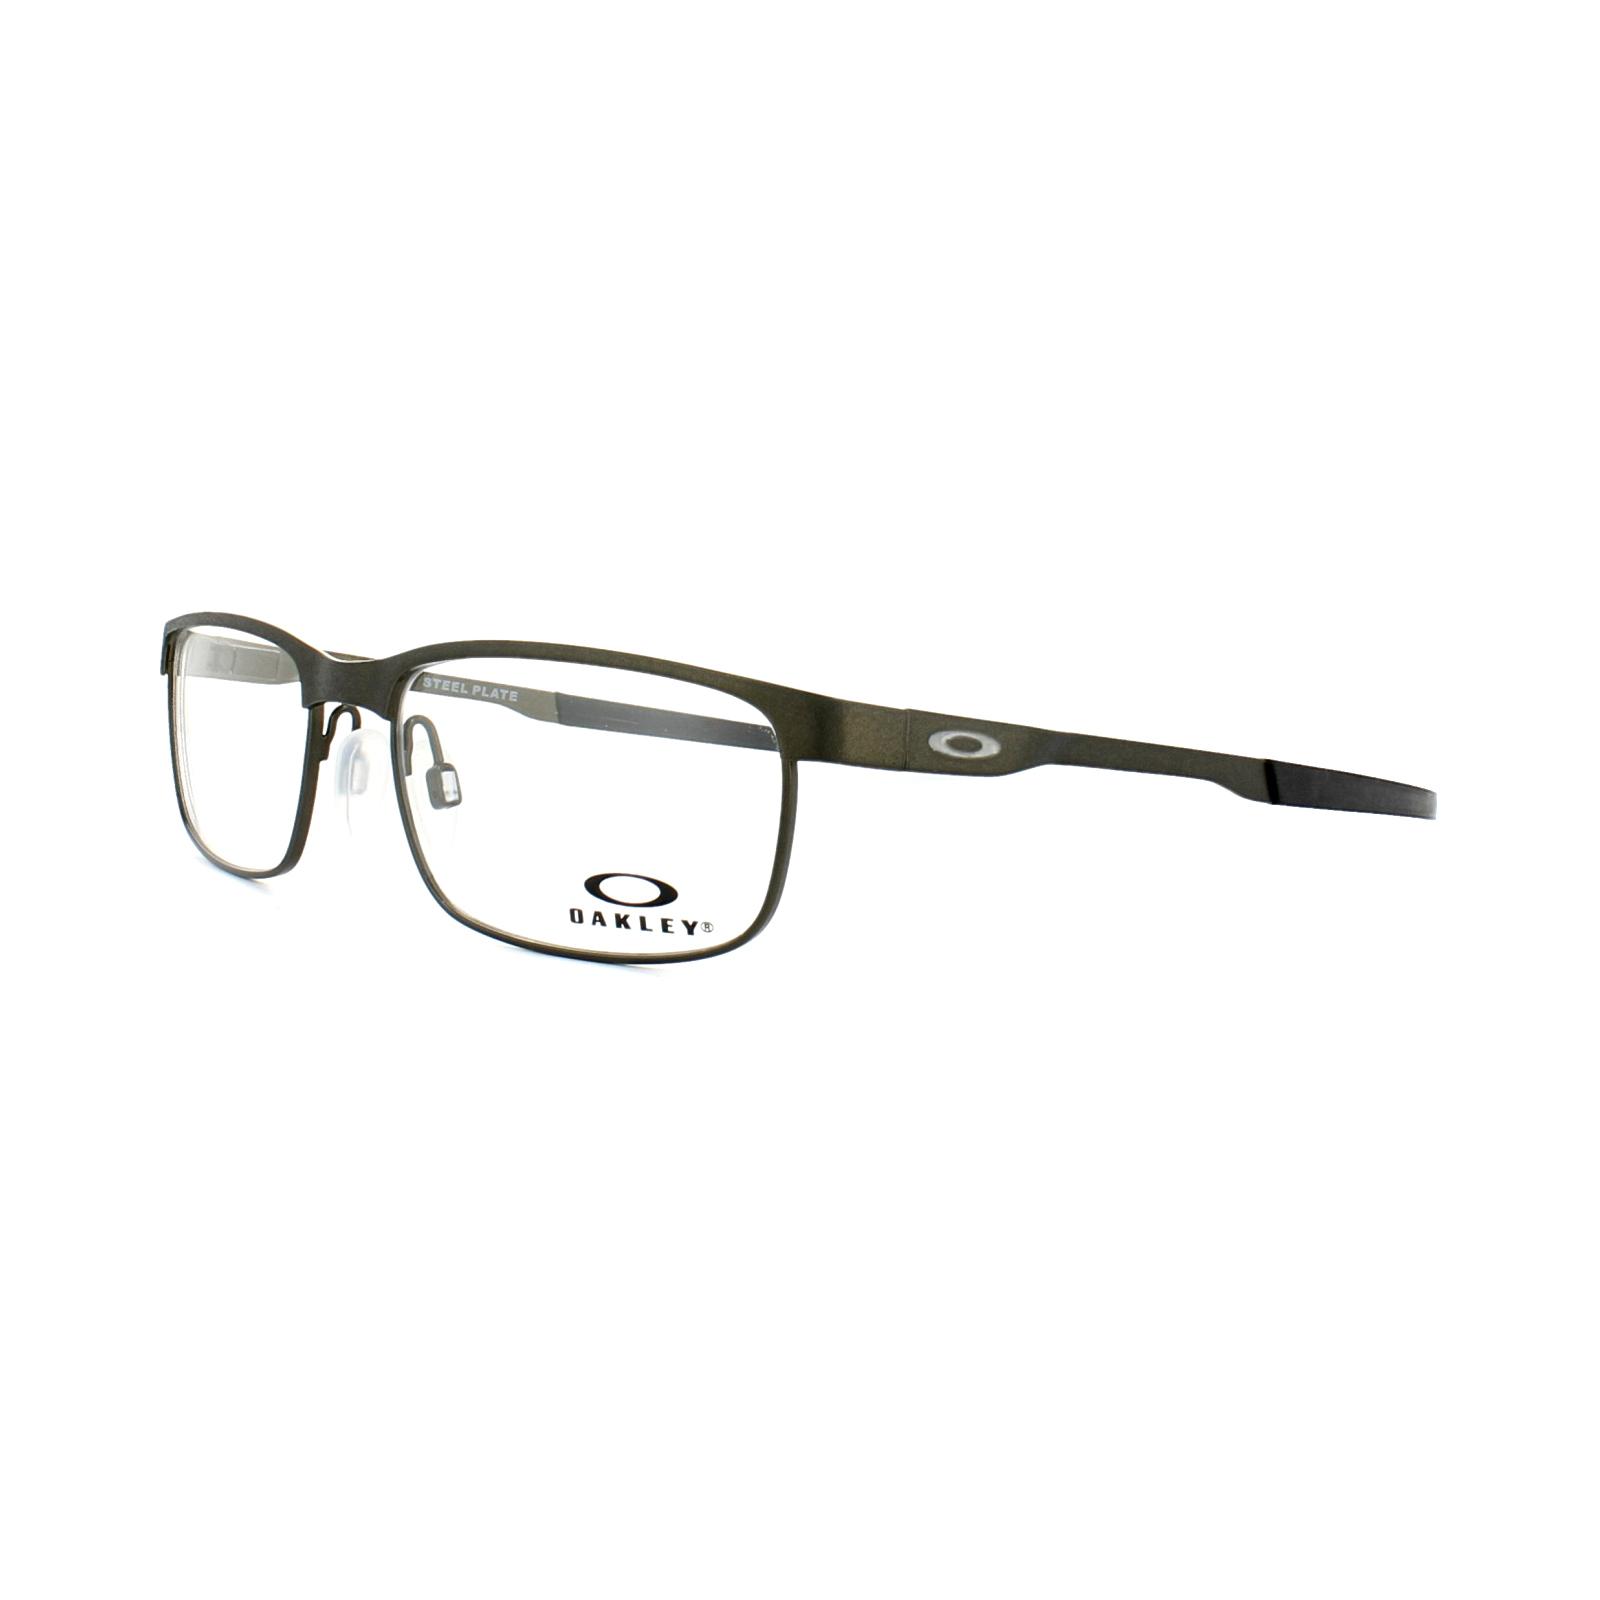 20030e2dfb Sentinel Oakley Glasses Frames Steel Plate OX3222-04 Powder Pewter